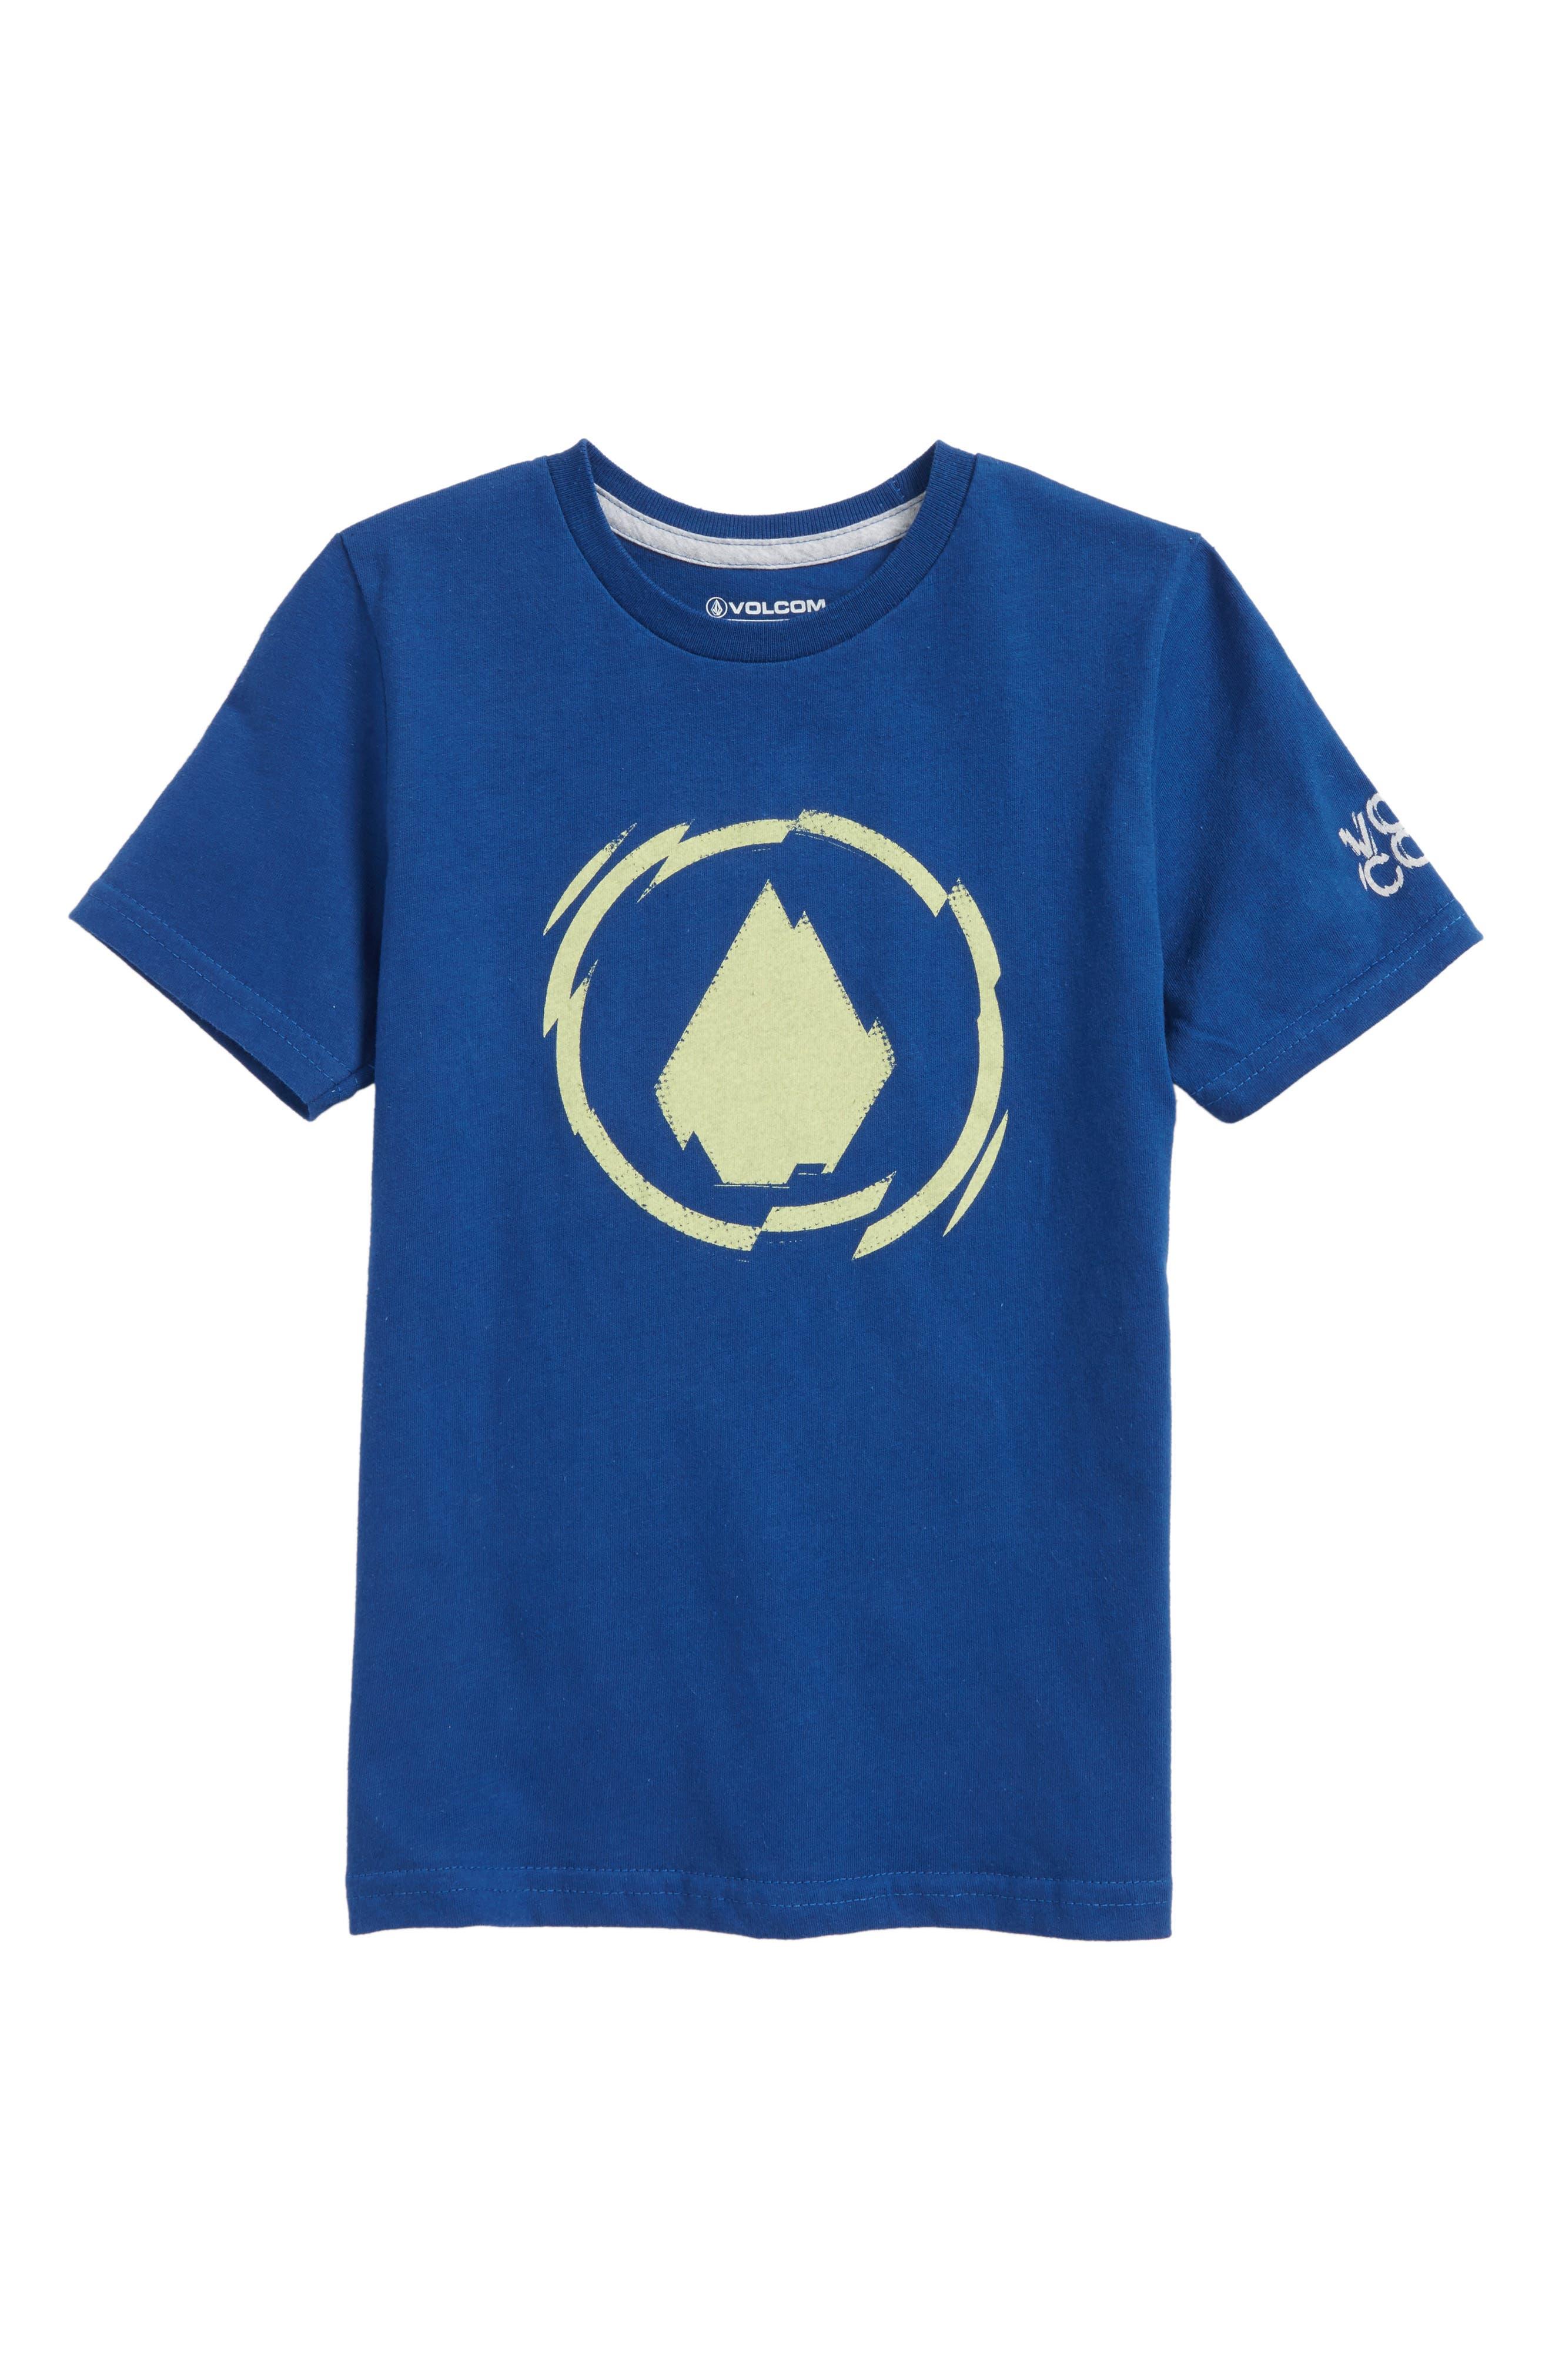 Main Image - Volcom Shatter T-Shirt (Big Boys)